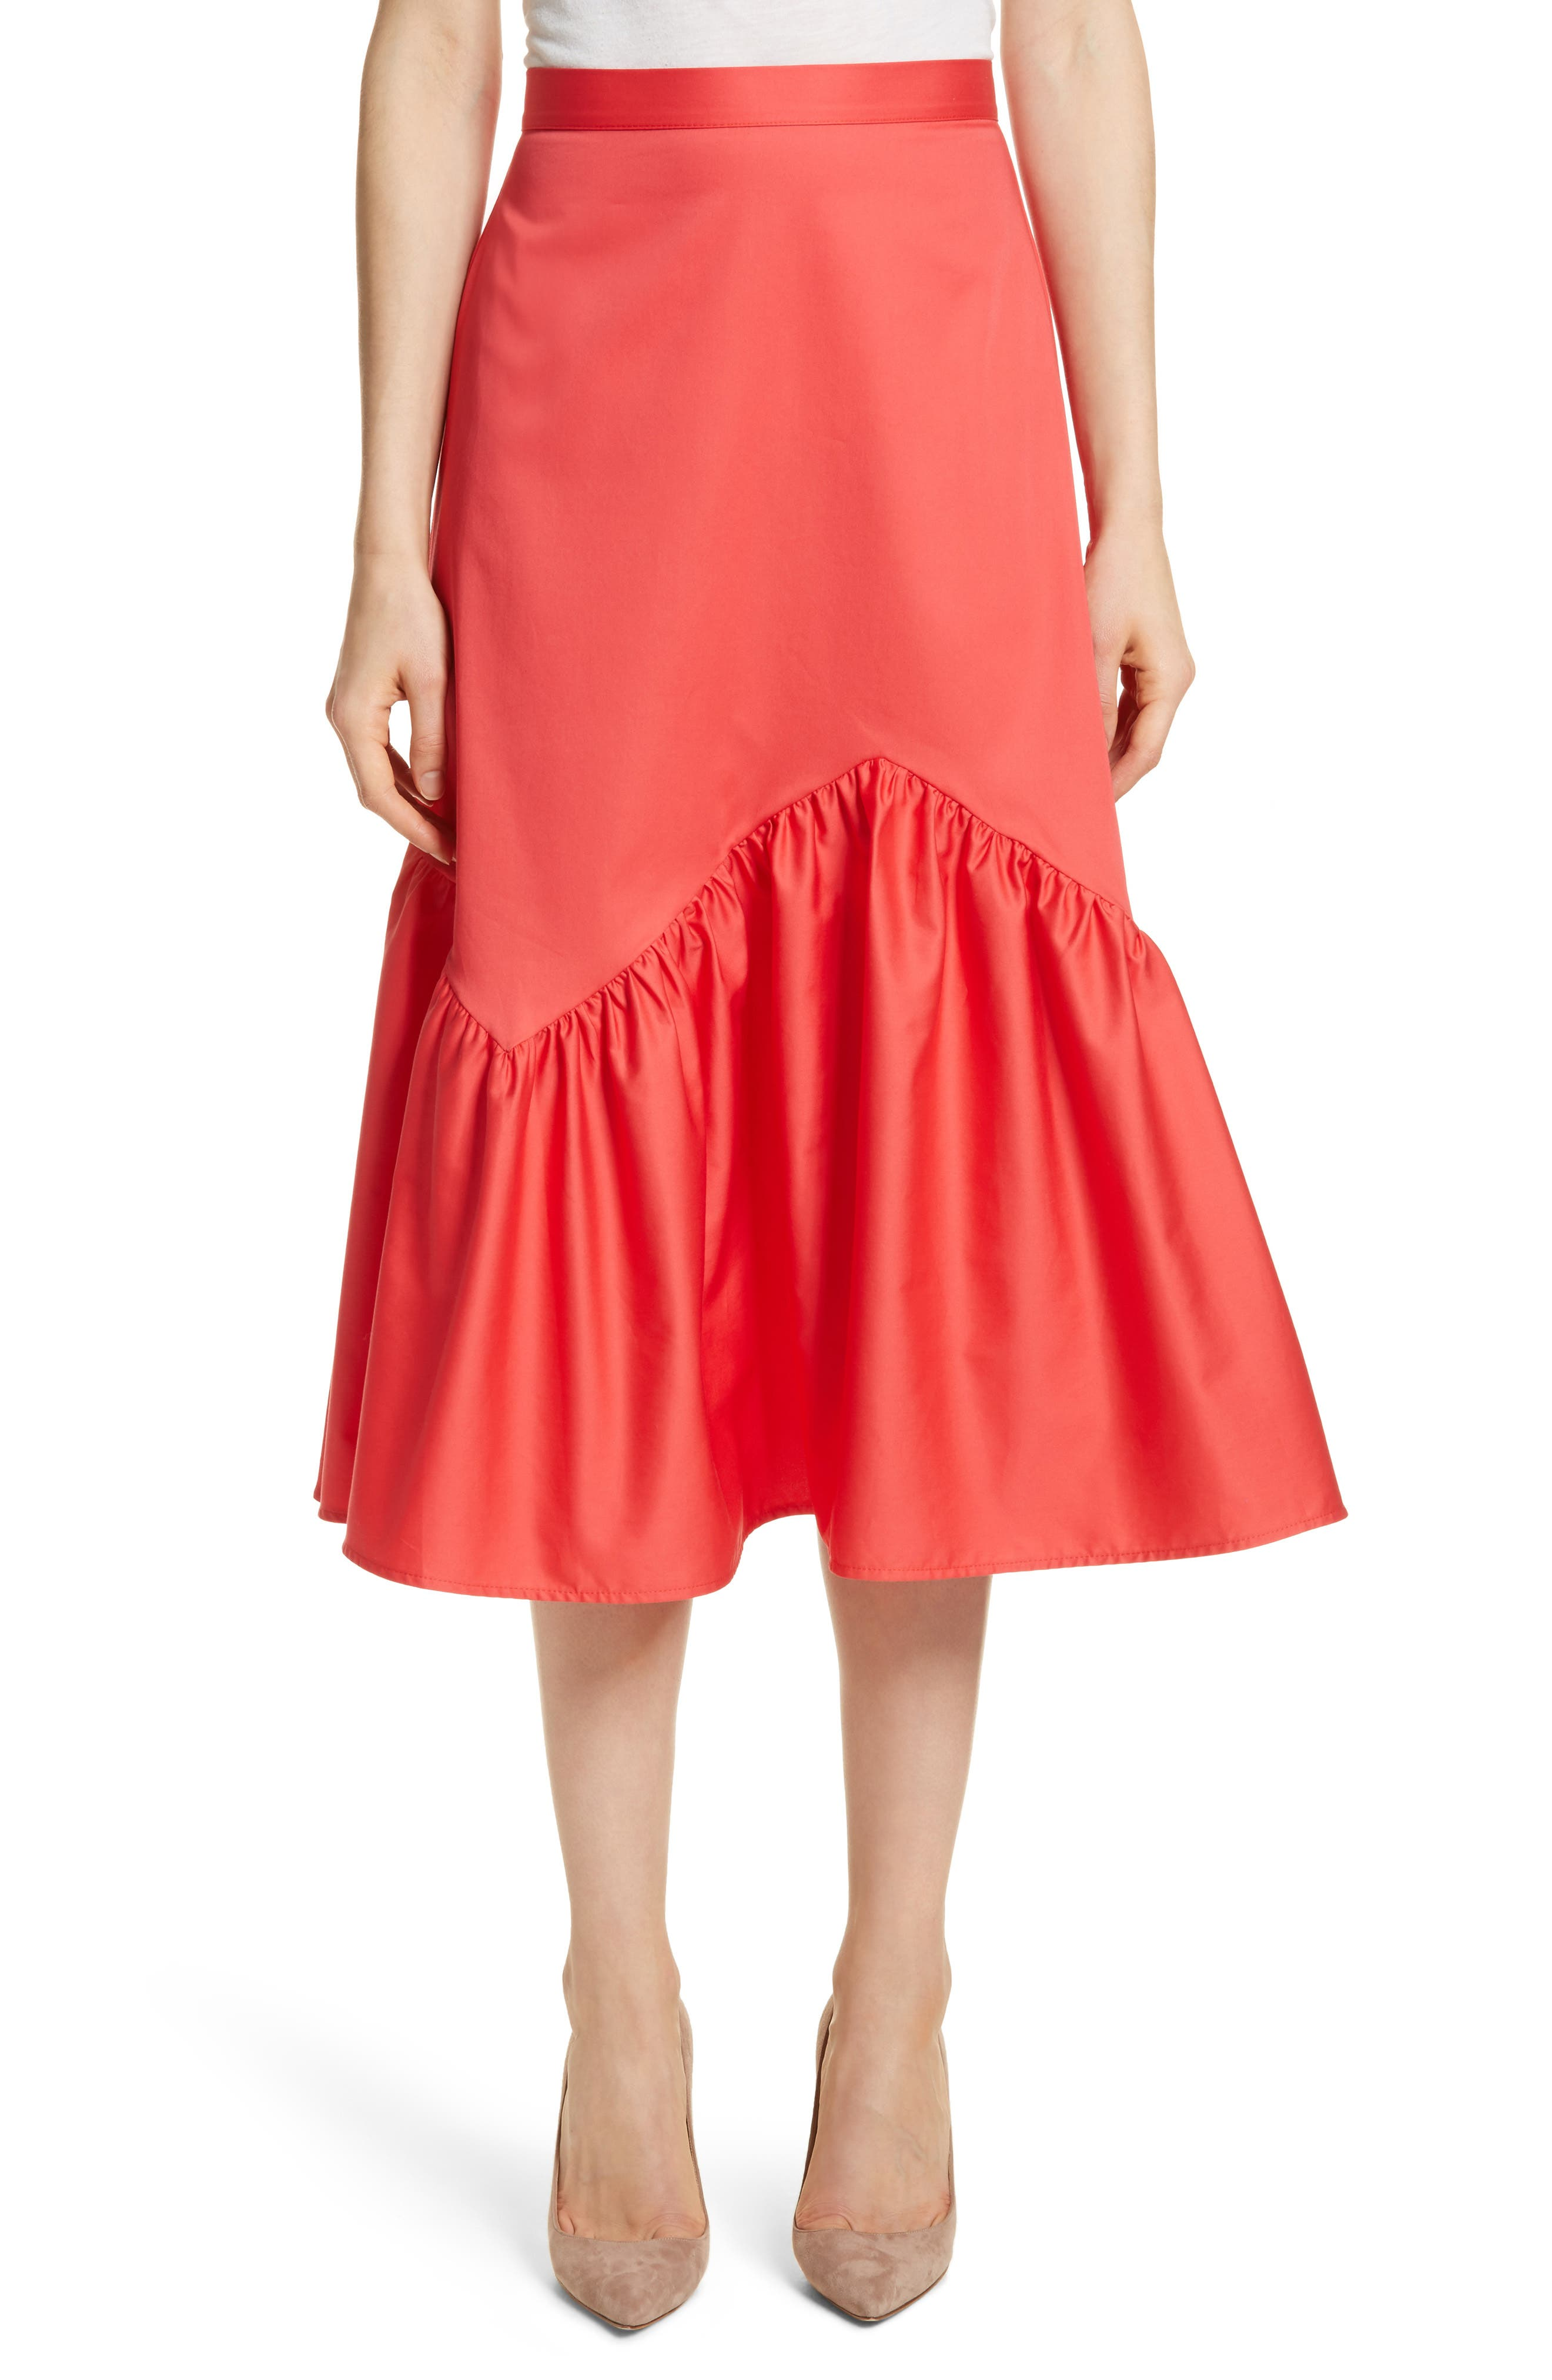 Prose & Poetry Tyra Midi Skirt,                         Main,                         color, 621